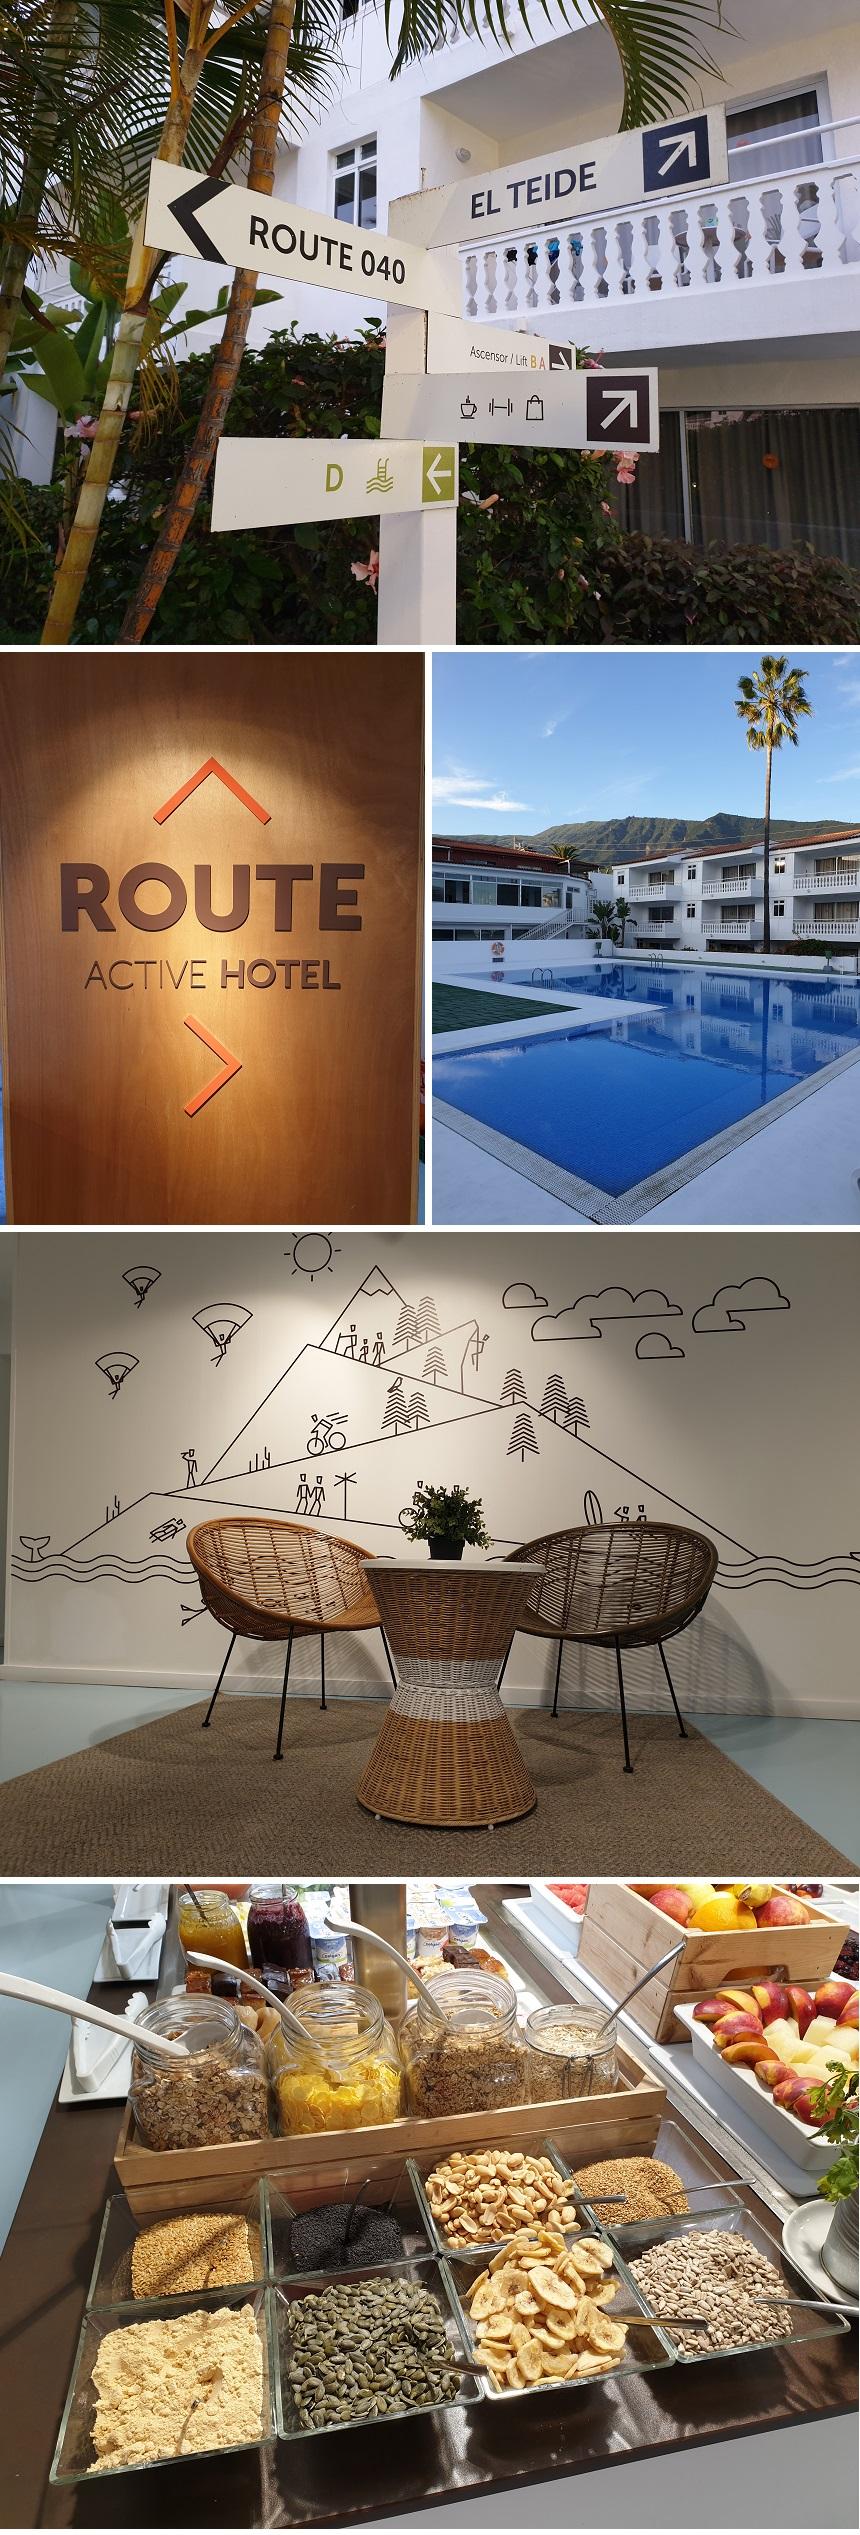 Route Active Hotel Tenerife